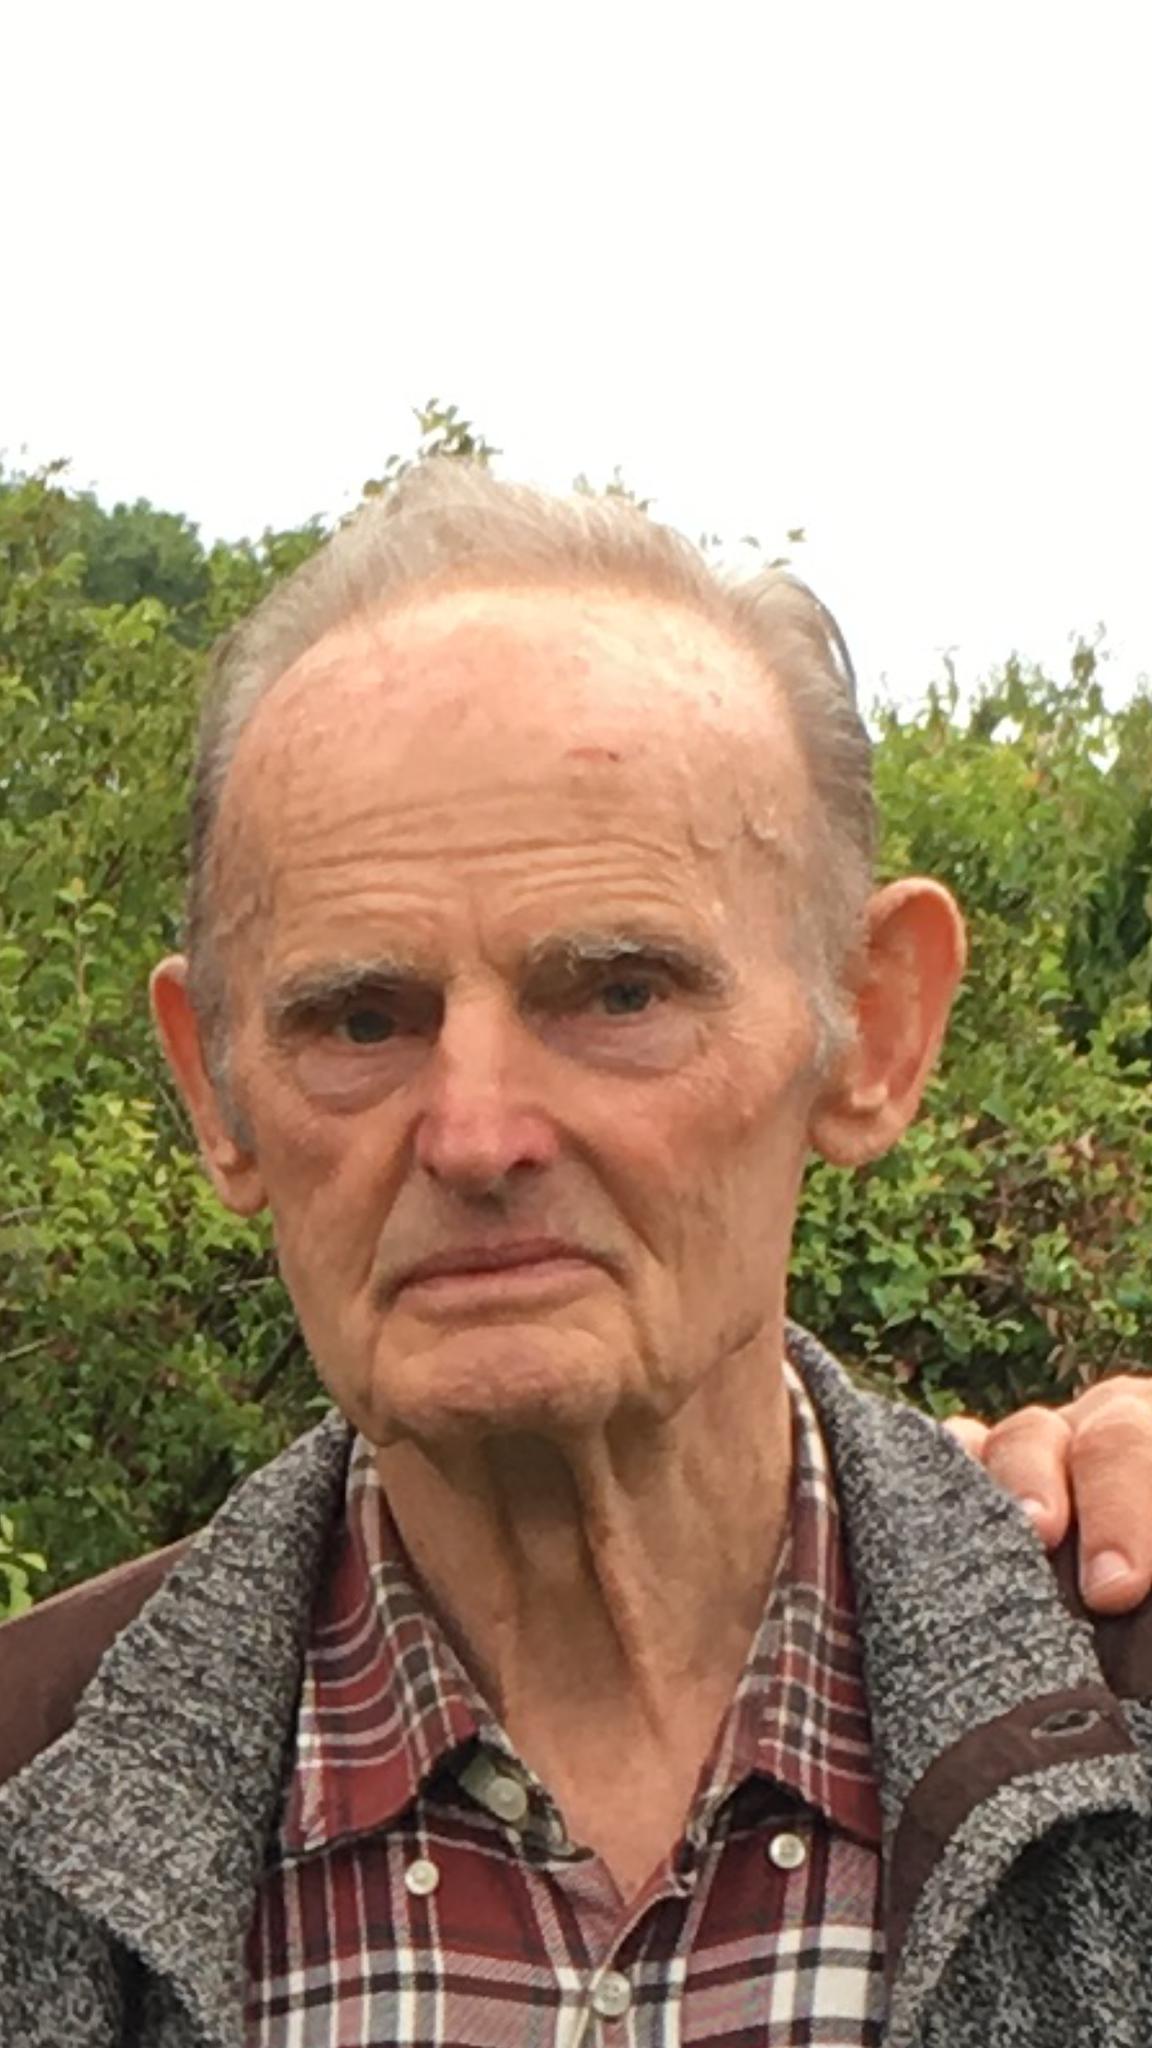 Rudi Geringer lebt in Traun